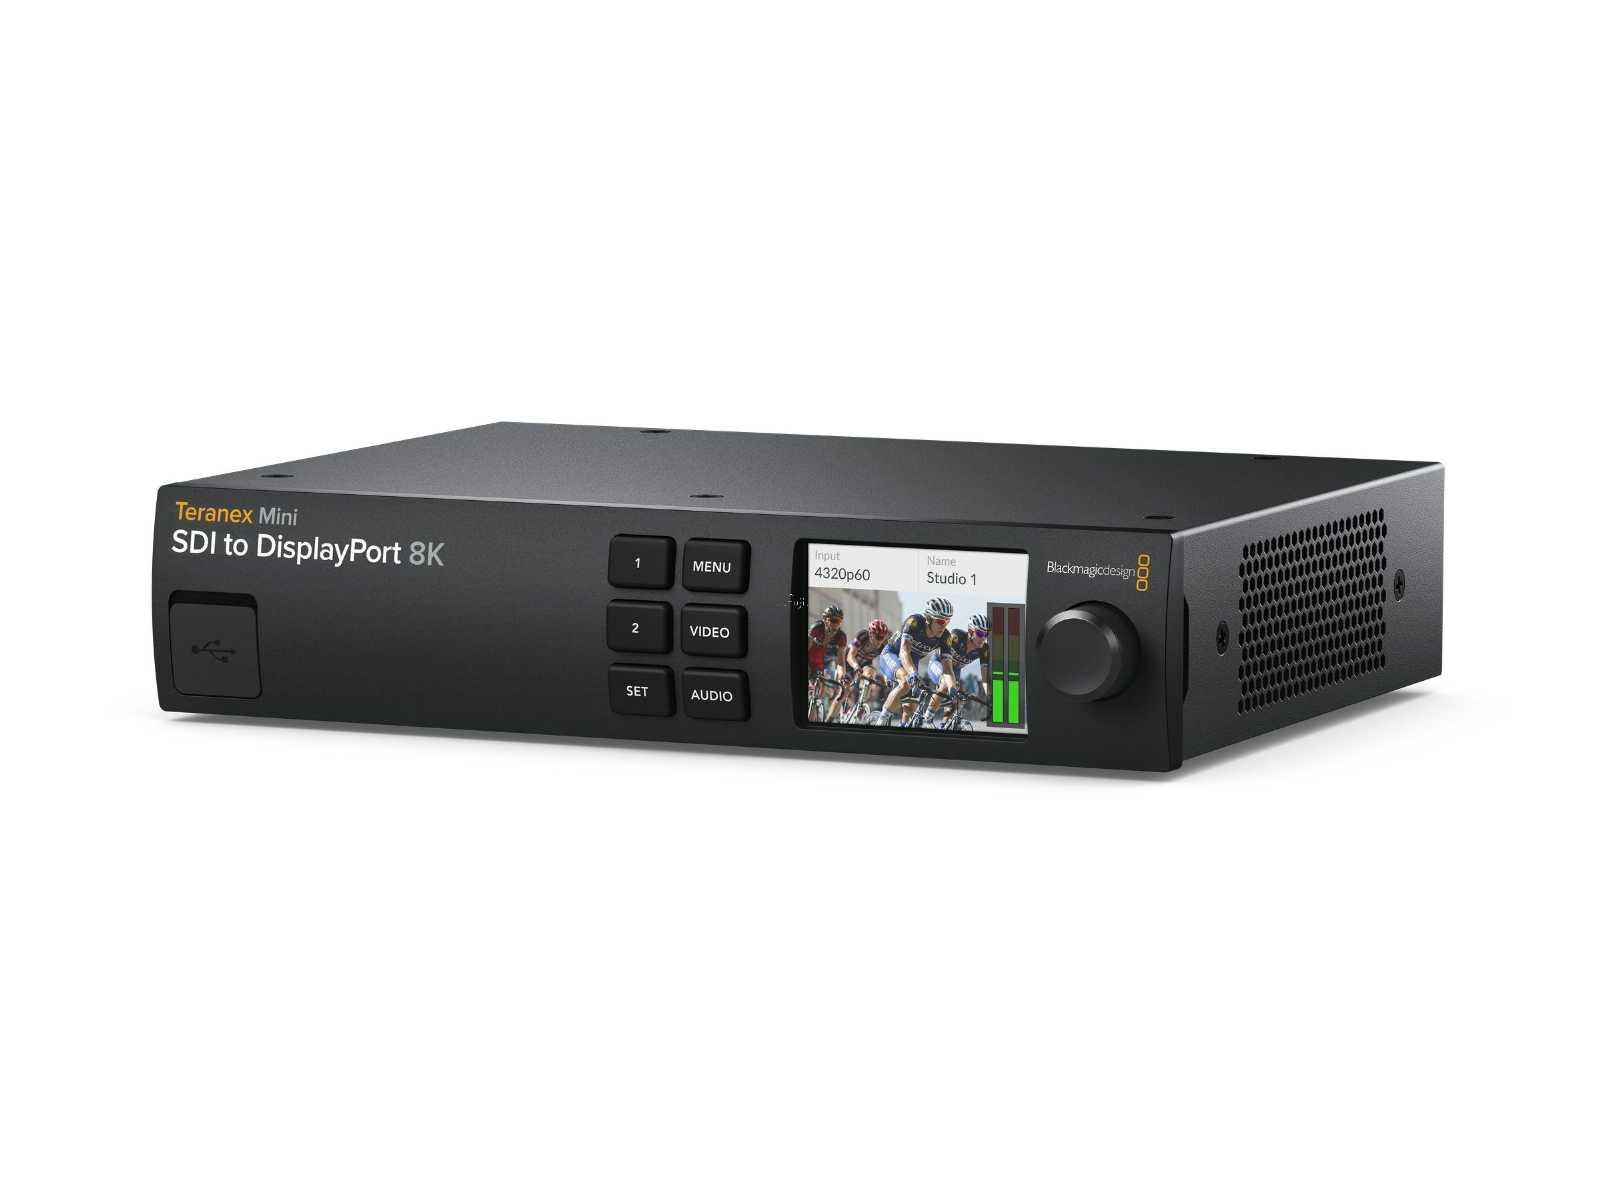 Teranex Mini SDI to DisplayPort 8K HDR 蝺刻?嚗�A15516